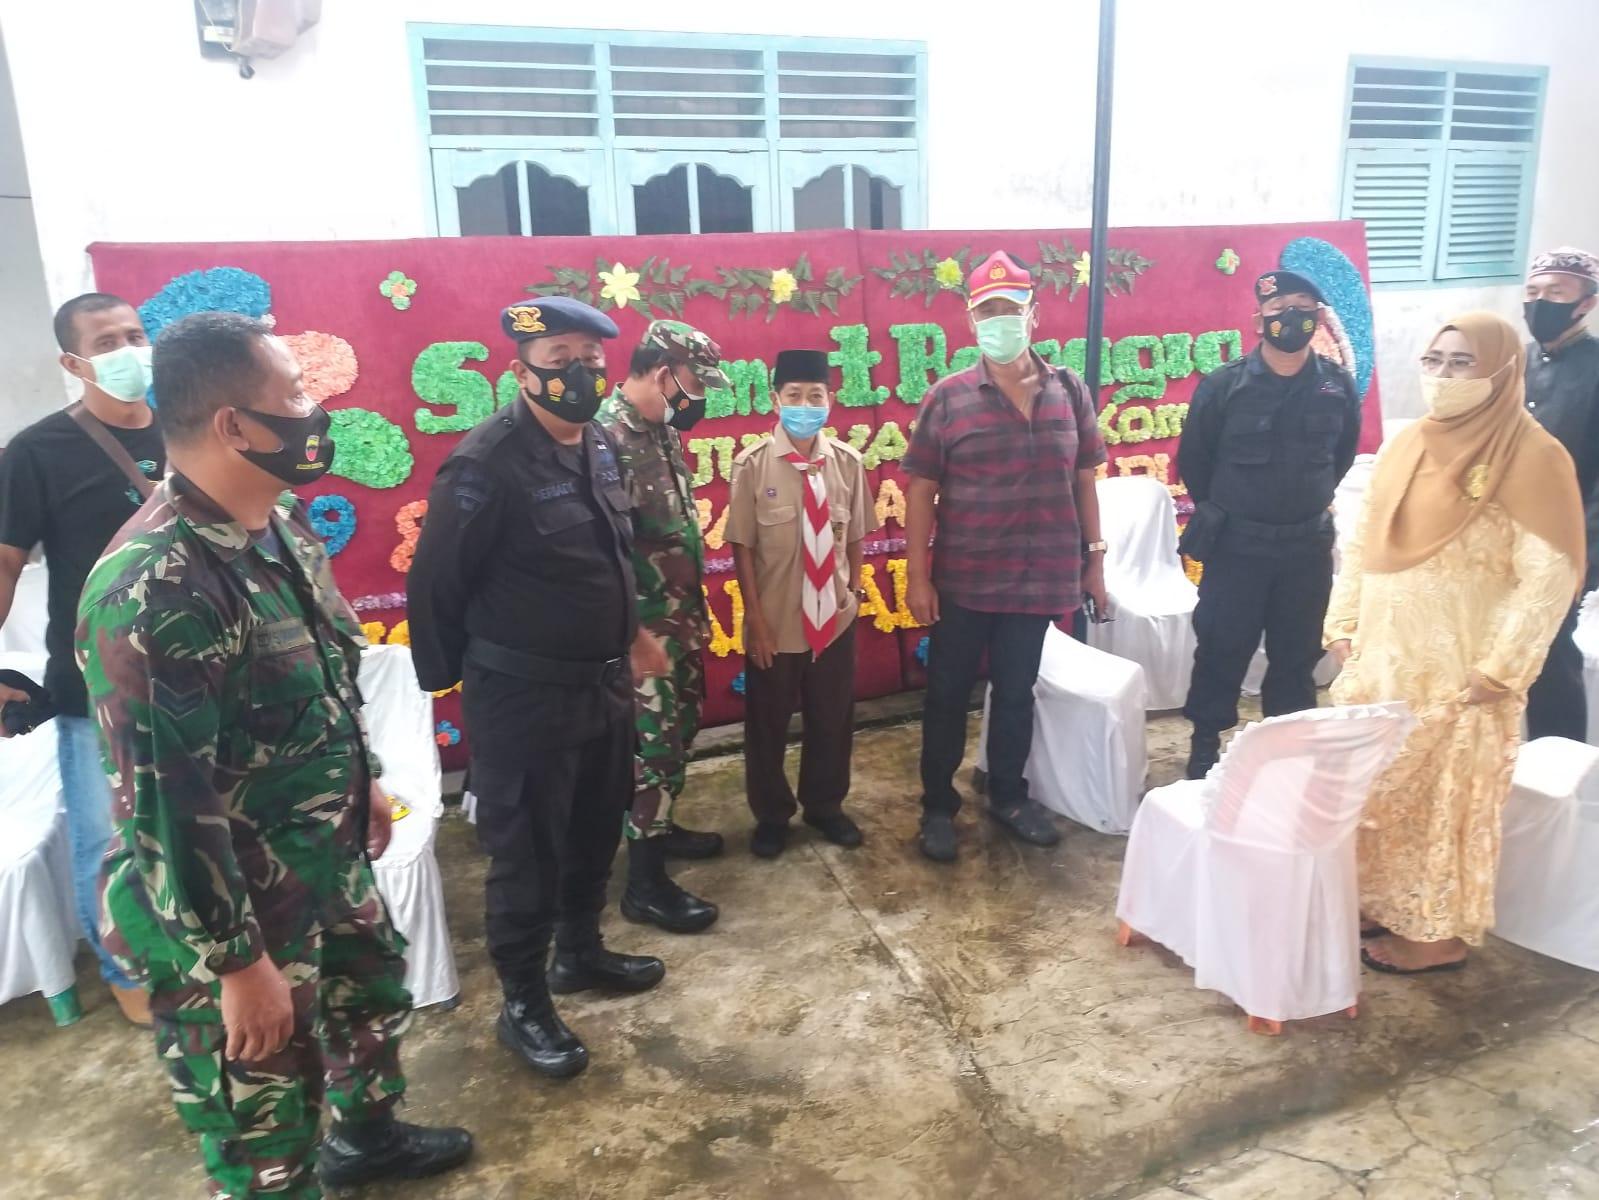 Langgar PPKM, Polsek Patumbak & Satgas Covid-19 Bubarkan Pesta Pernikahan